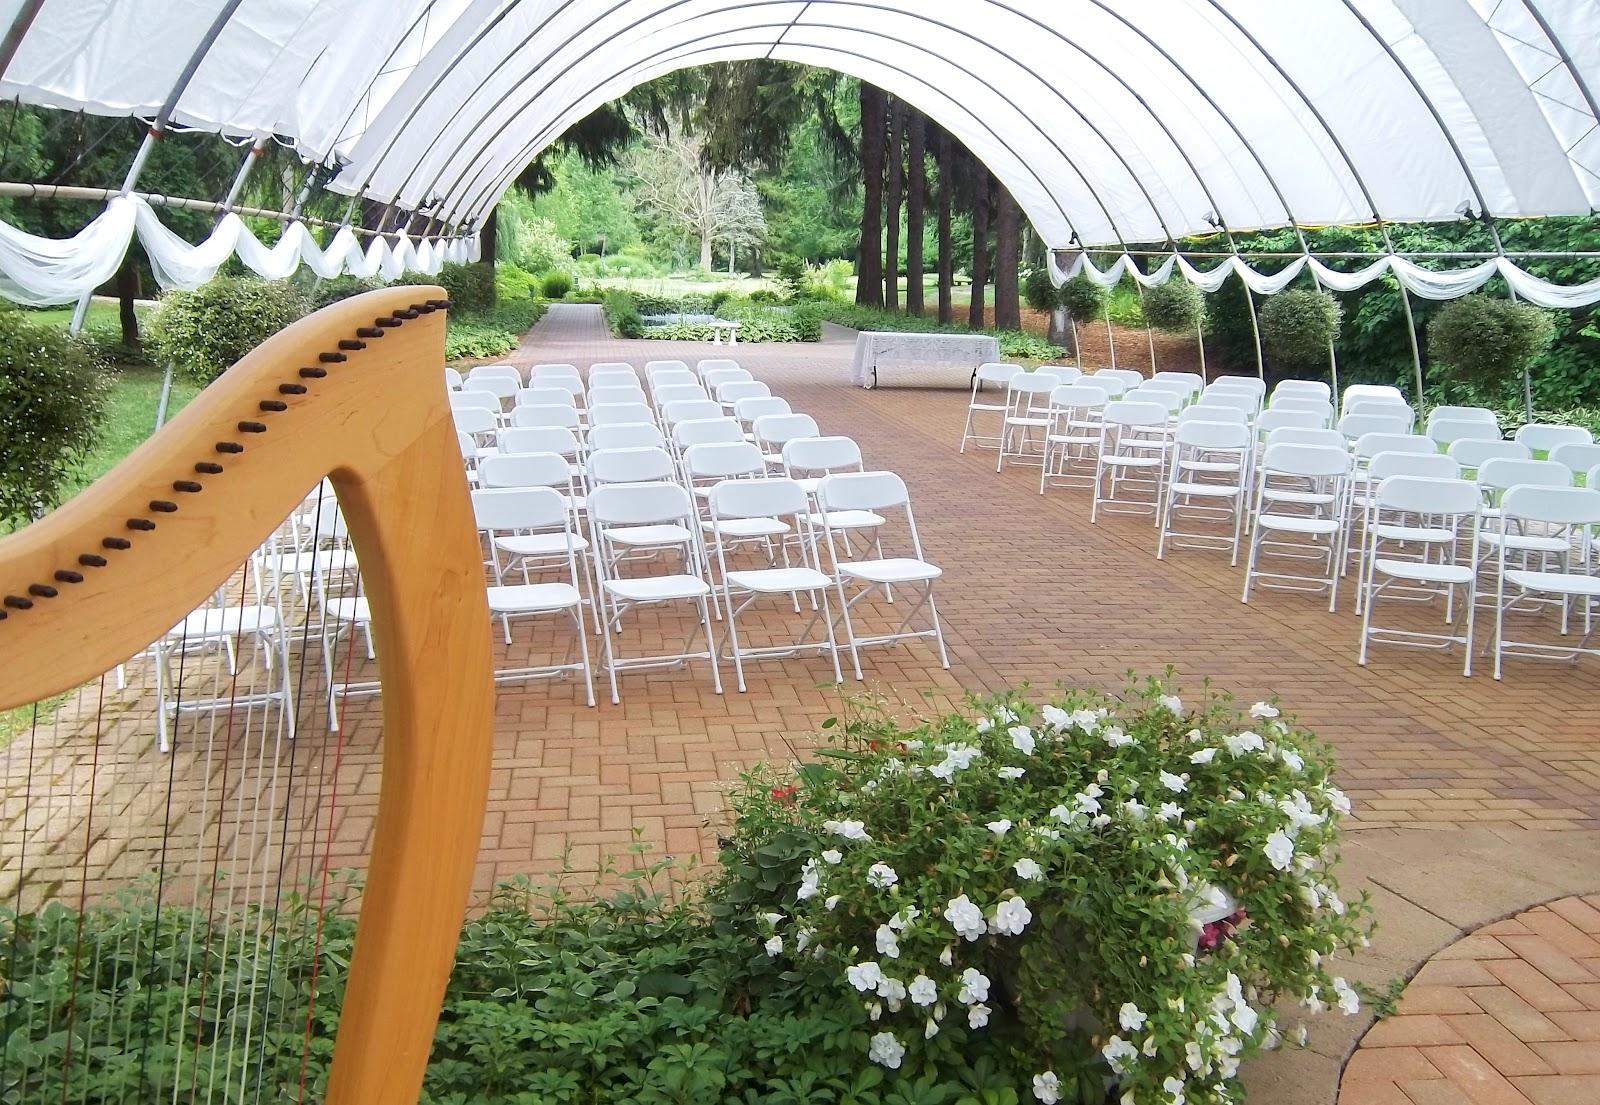 The Classic Harpist Michigan City Harpist Wedding At The International Friendship Gardens